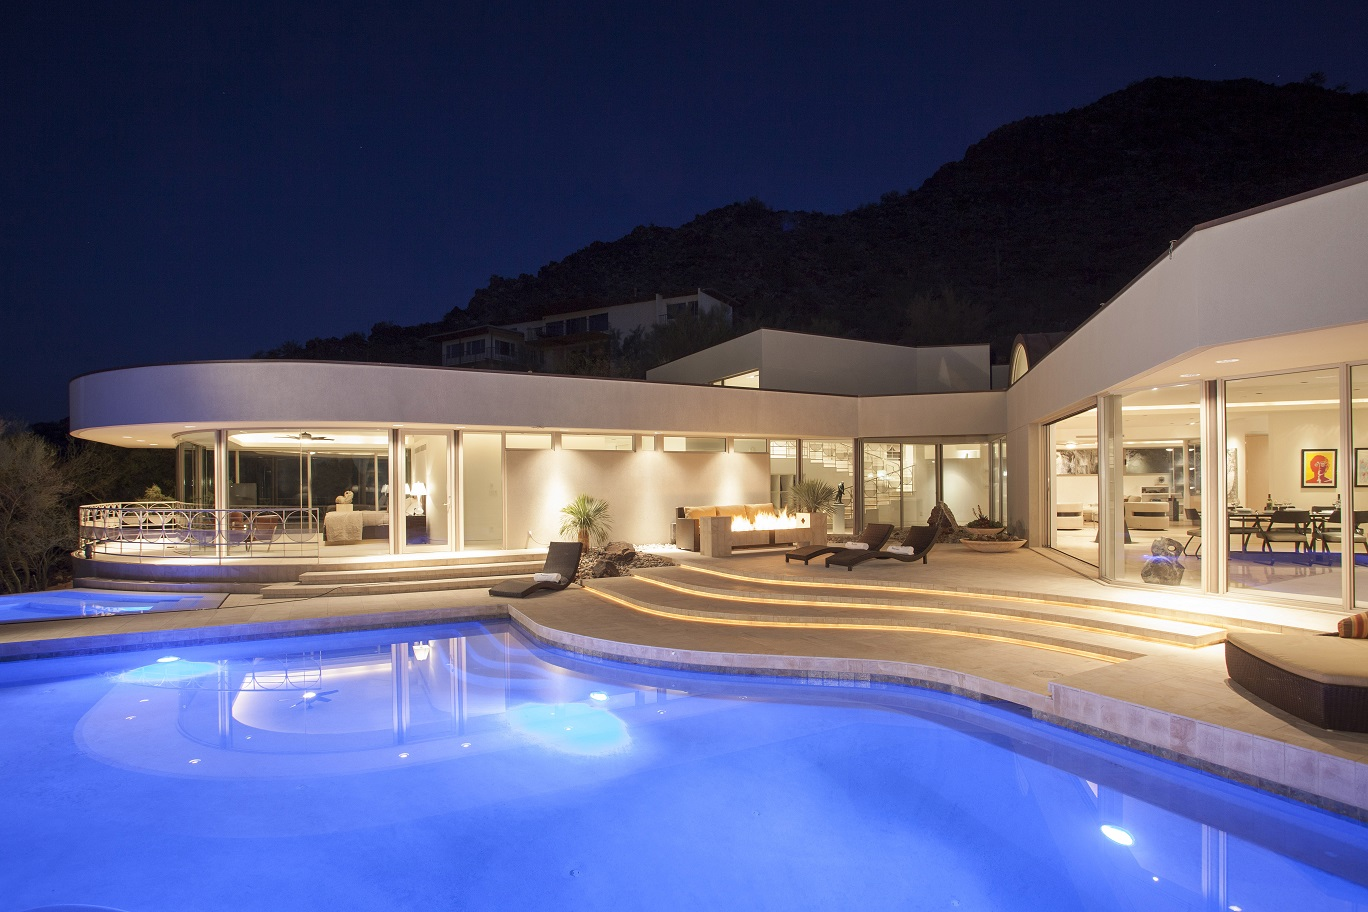 Vacation Rental Property Scottsdale Arizona